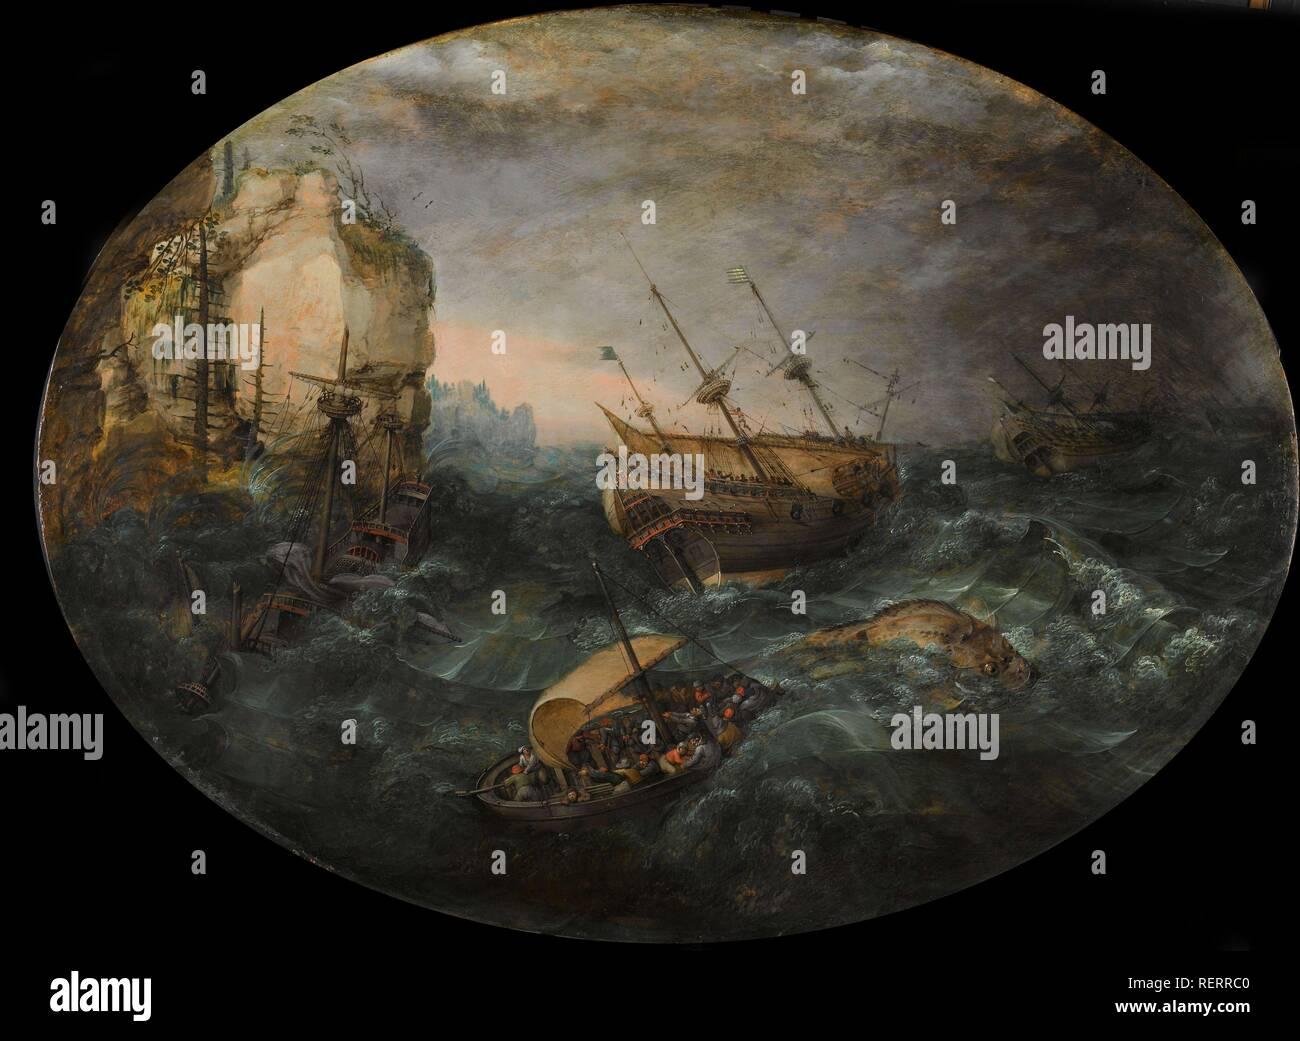 Shipwreck off a Rocky Coast. Schipbreuk op een rotsachtige kust. Dating: 1614. Measurements: support: h 64.5 cm × w 85.2 cm. Museum: Rijksmuseum, Amsterdam. Author: Adam Willaerts. - Stock Image